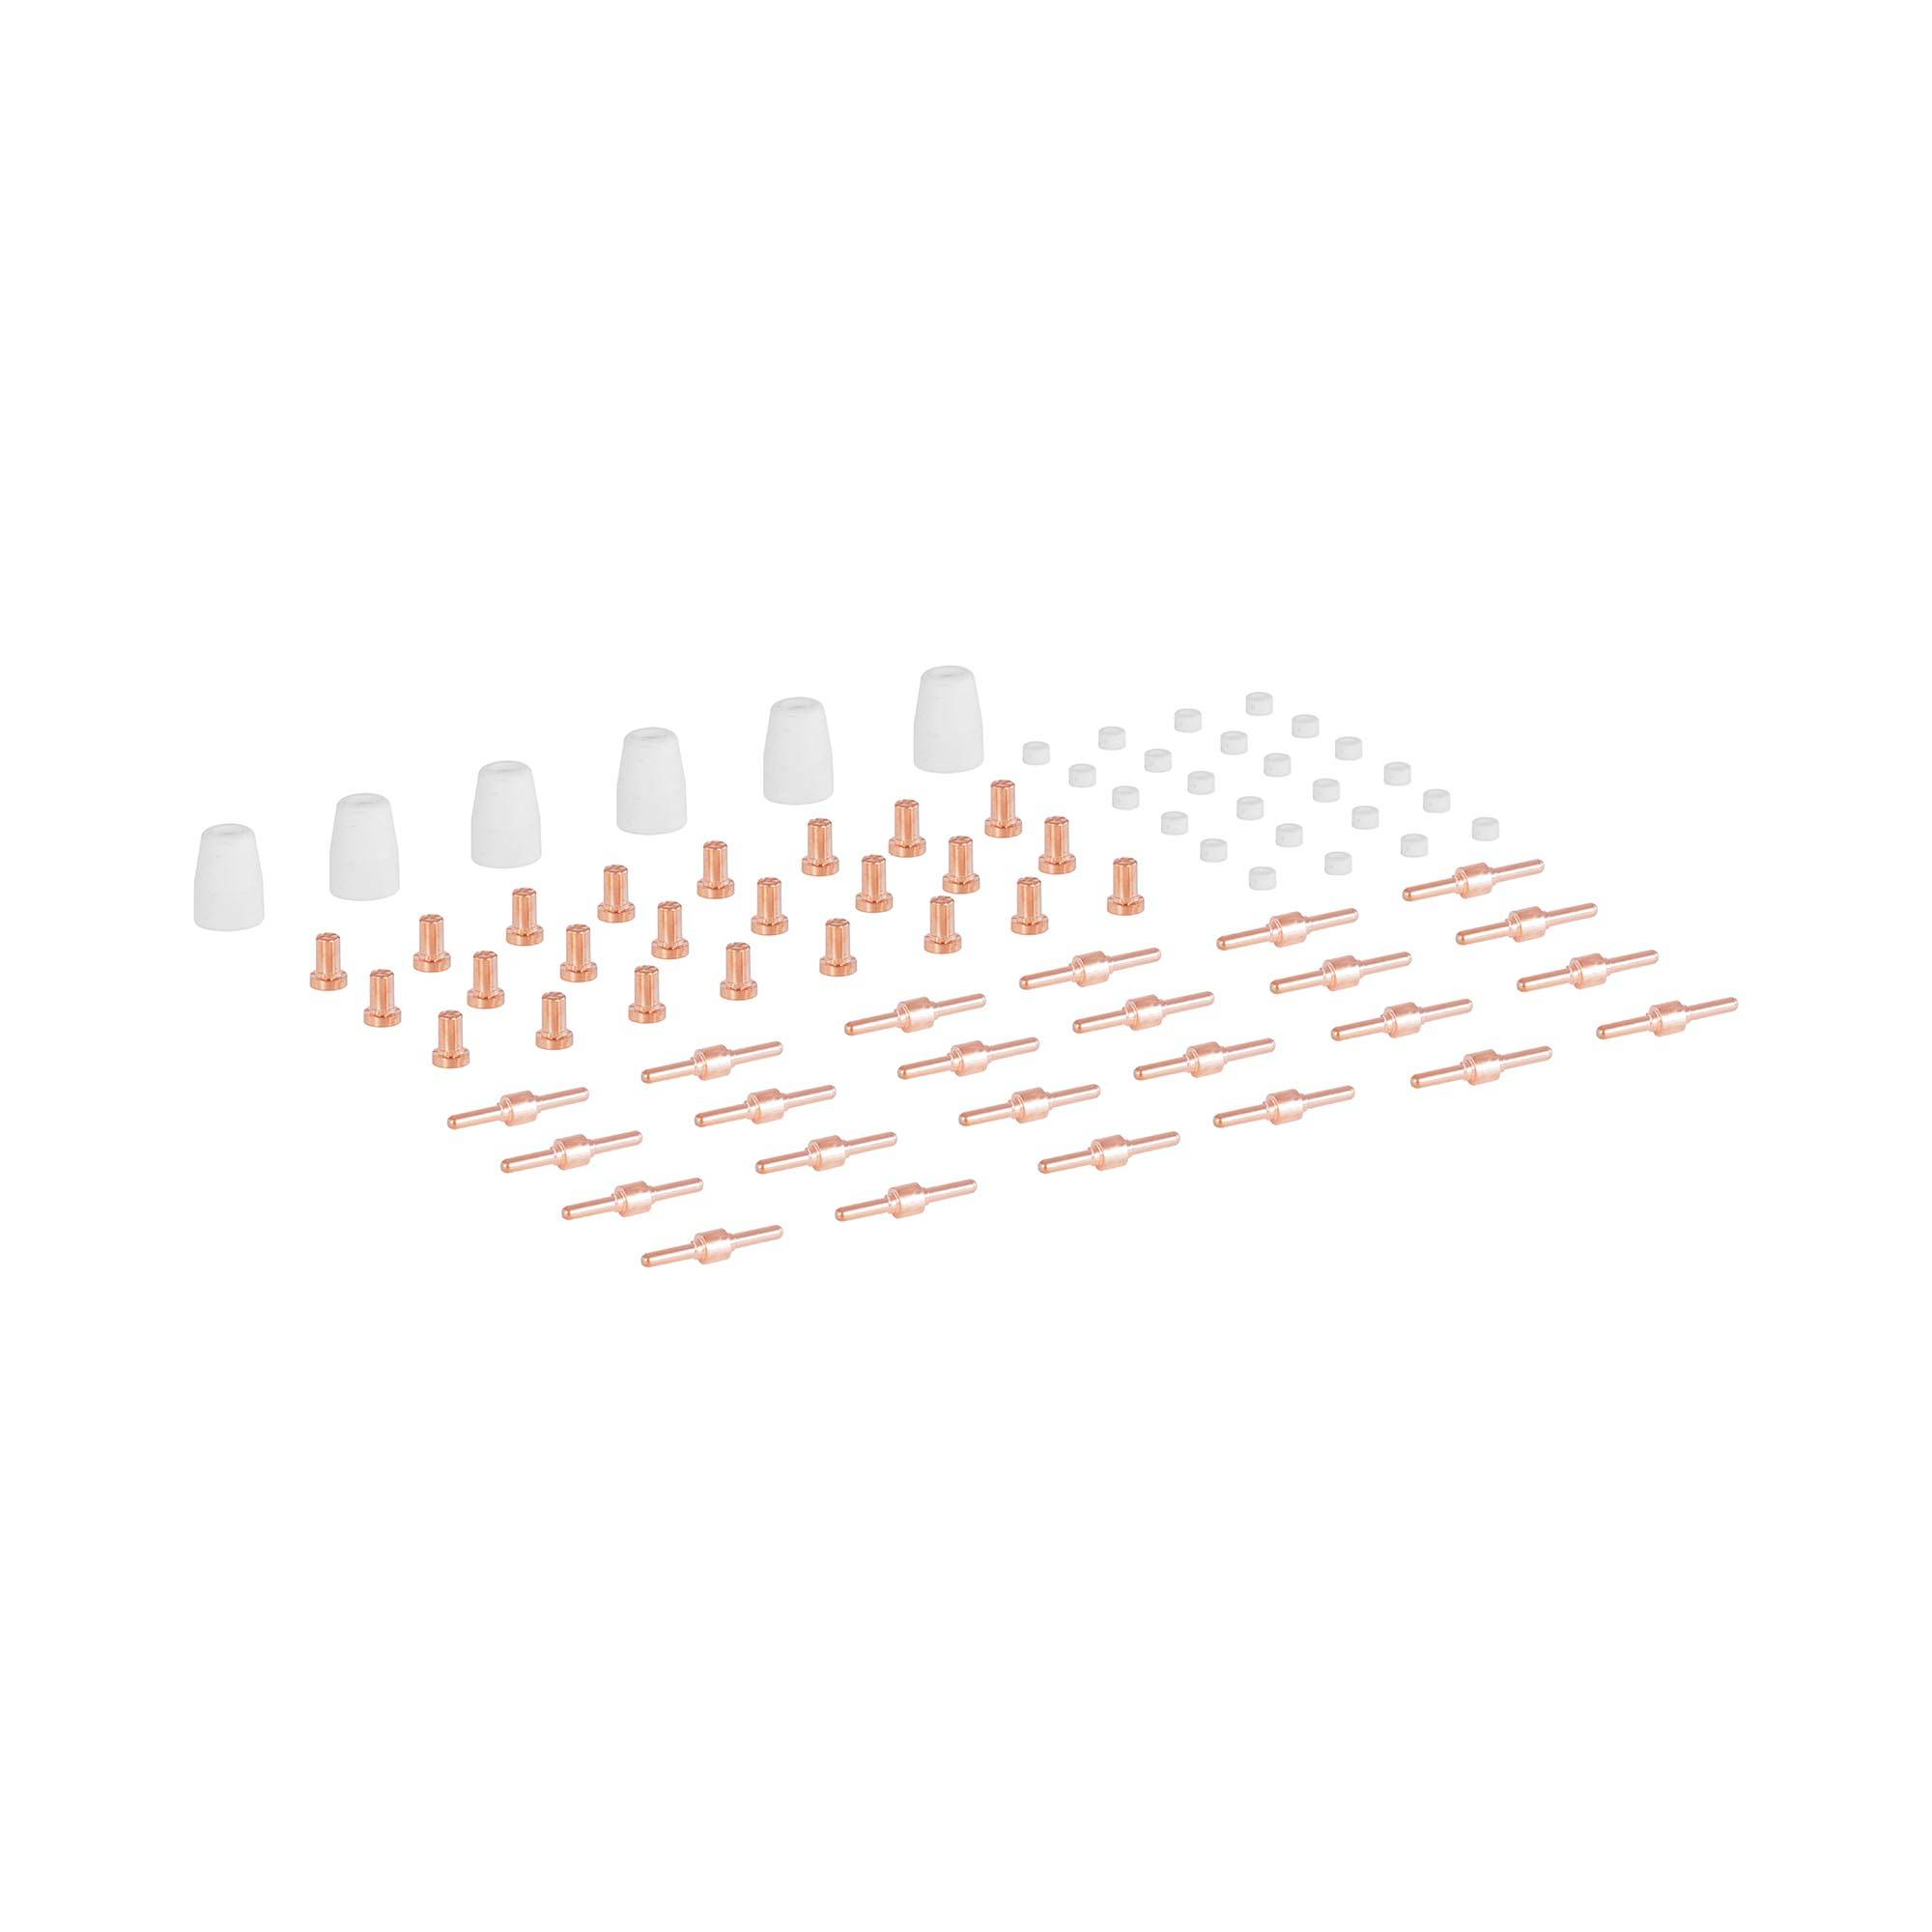 Stamos Welding Group Pièces de rechange Plasma - CUT 40 50 - gros